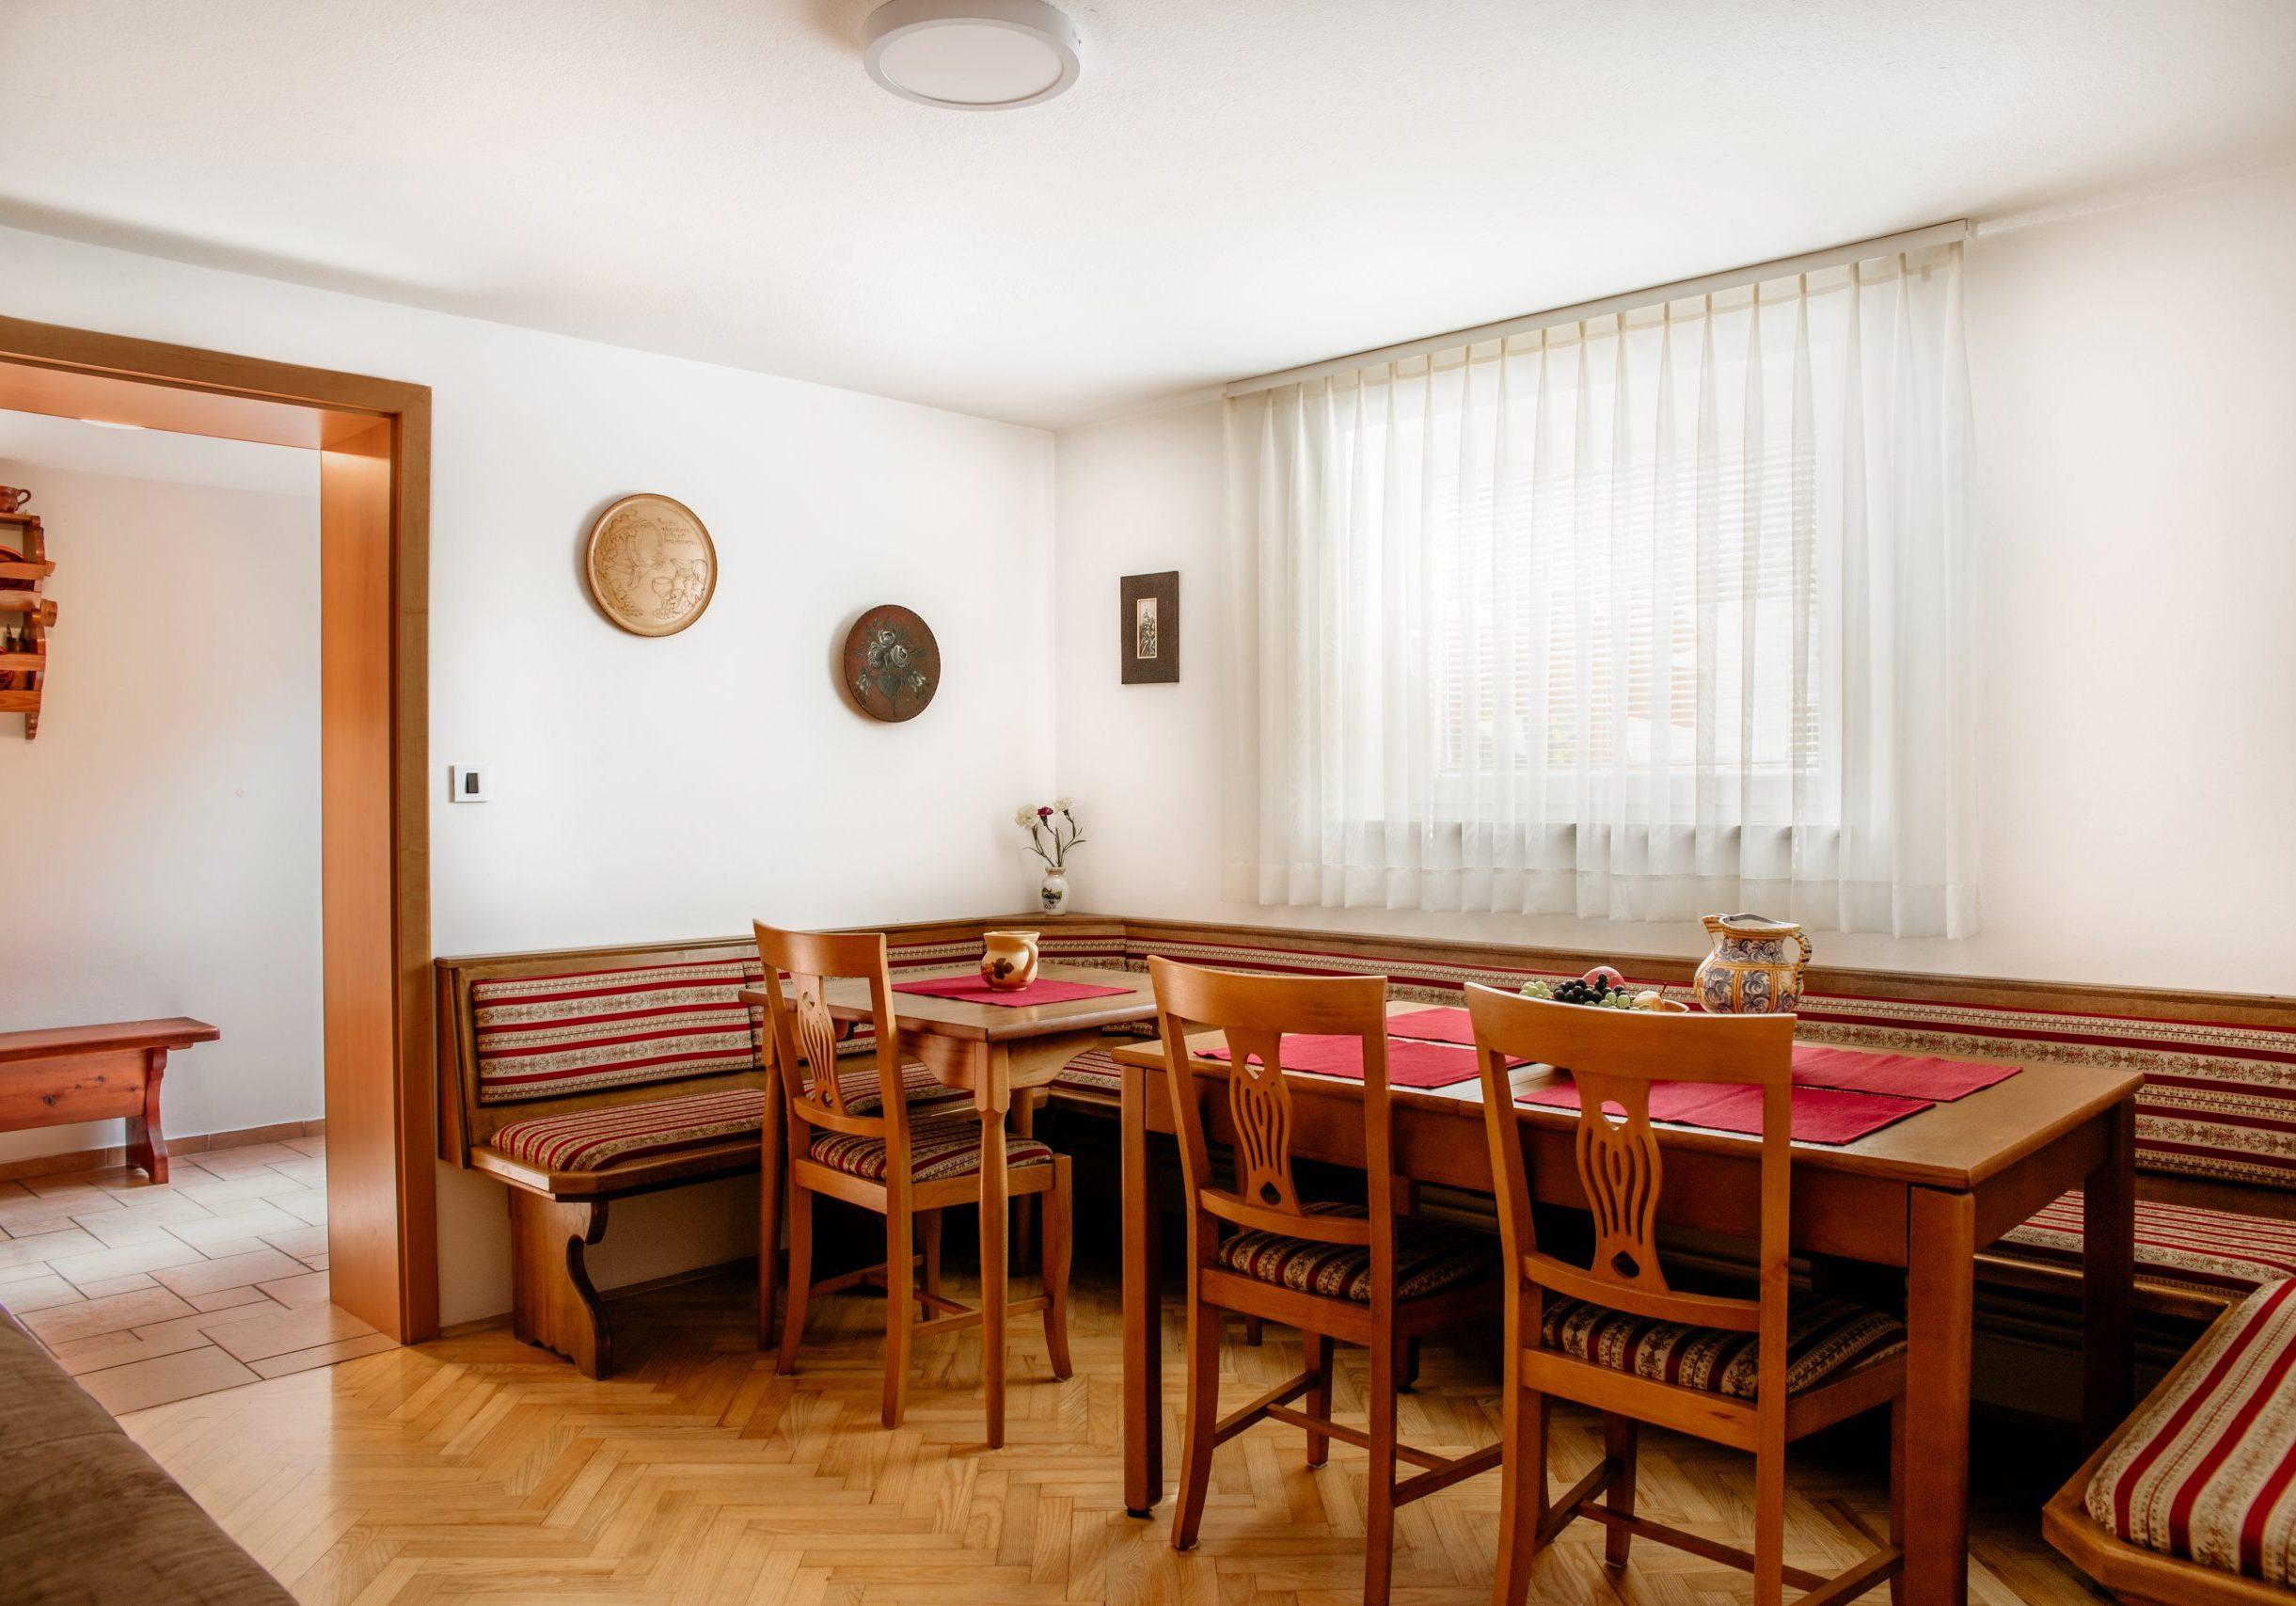 20200924-Fotografiranje-apartajev-Kristan-26